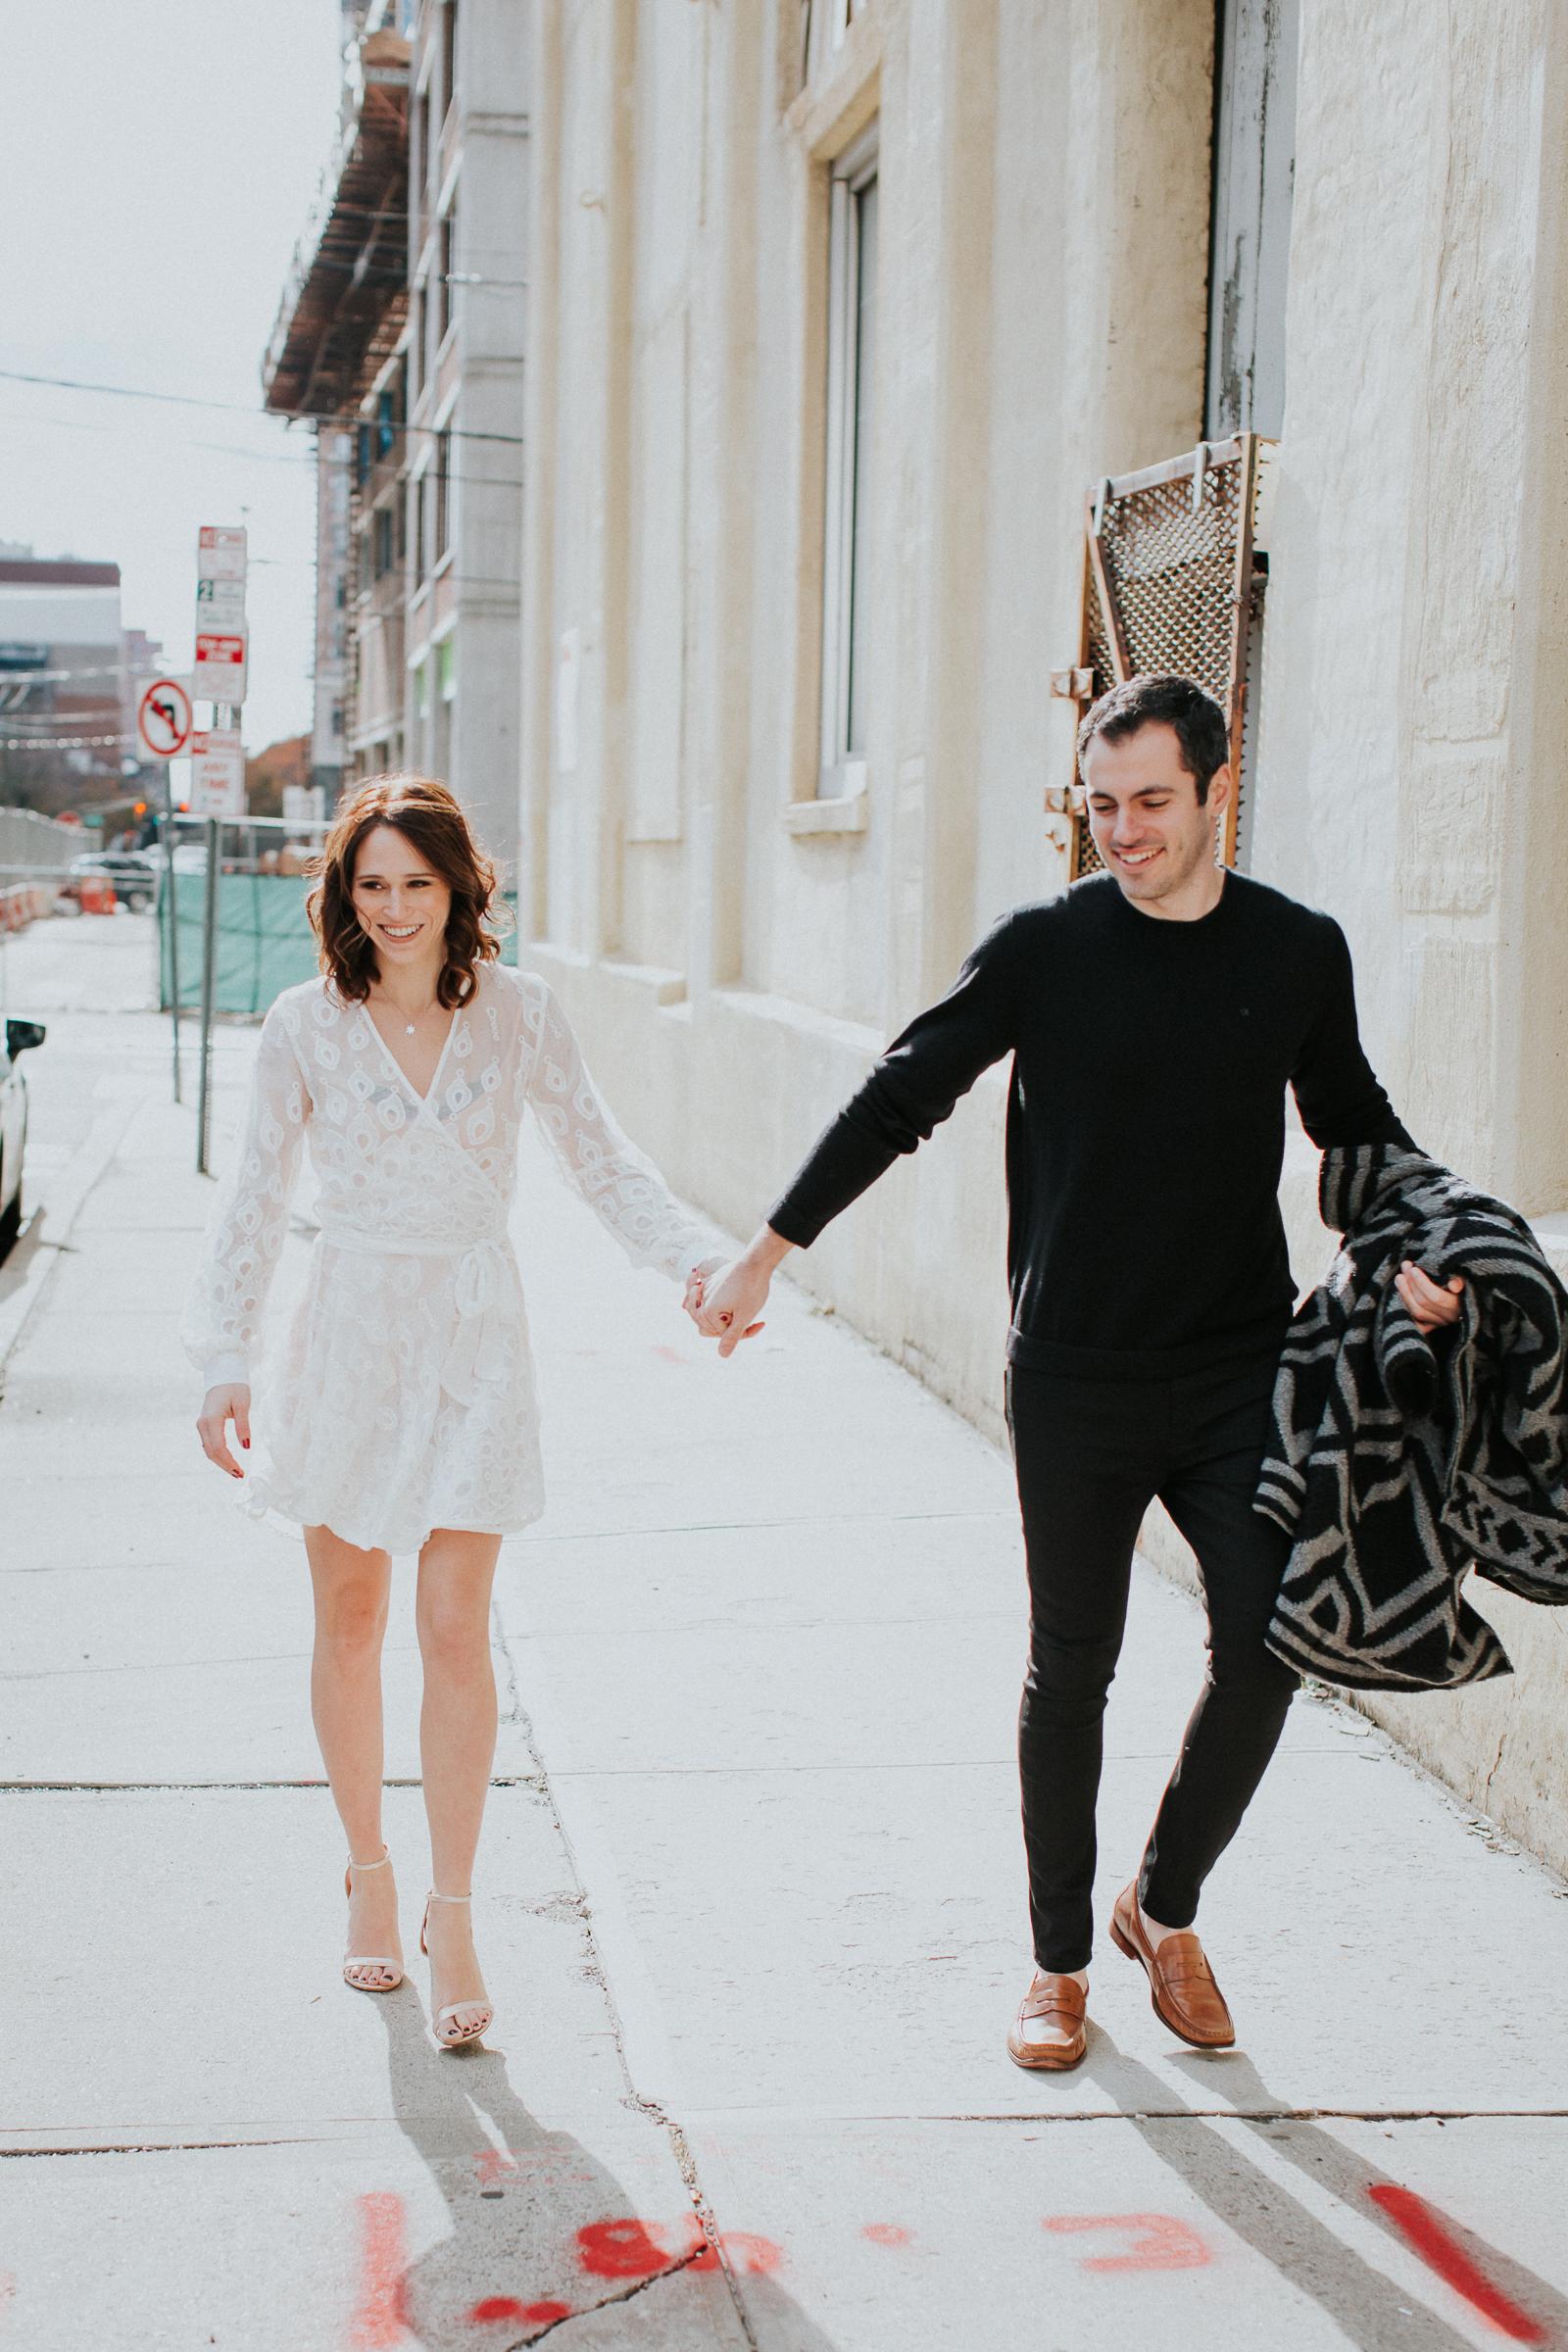 Jersey-City-Engagement-Photos-Documentary-Wedding-Photographer-NYC-16.jpg